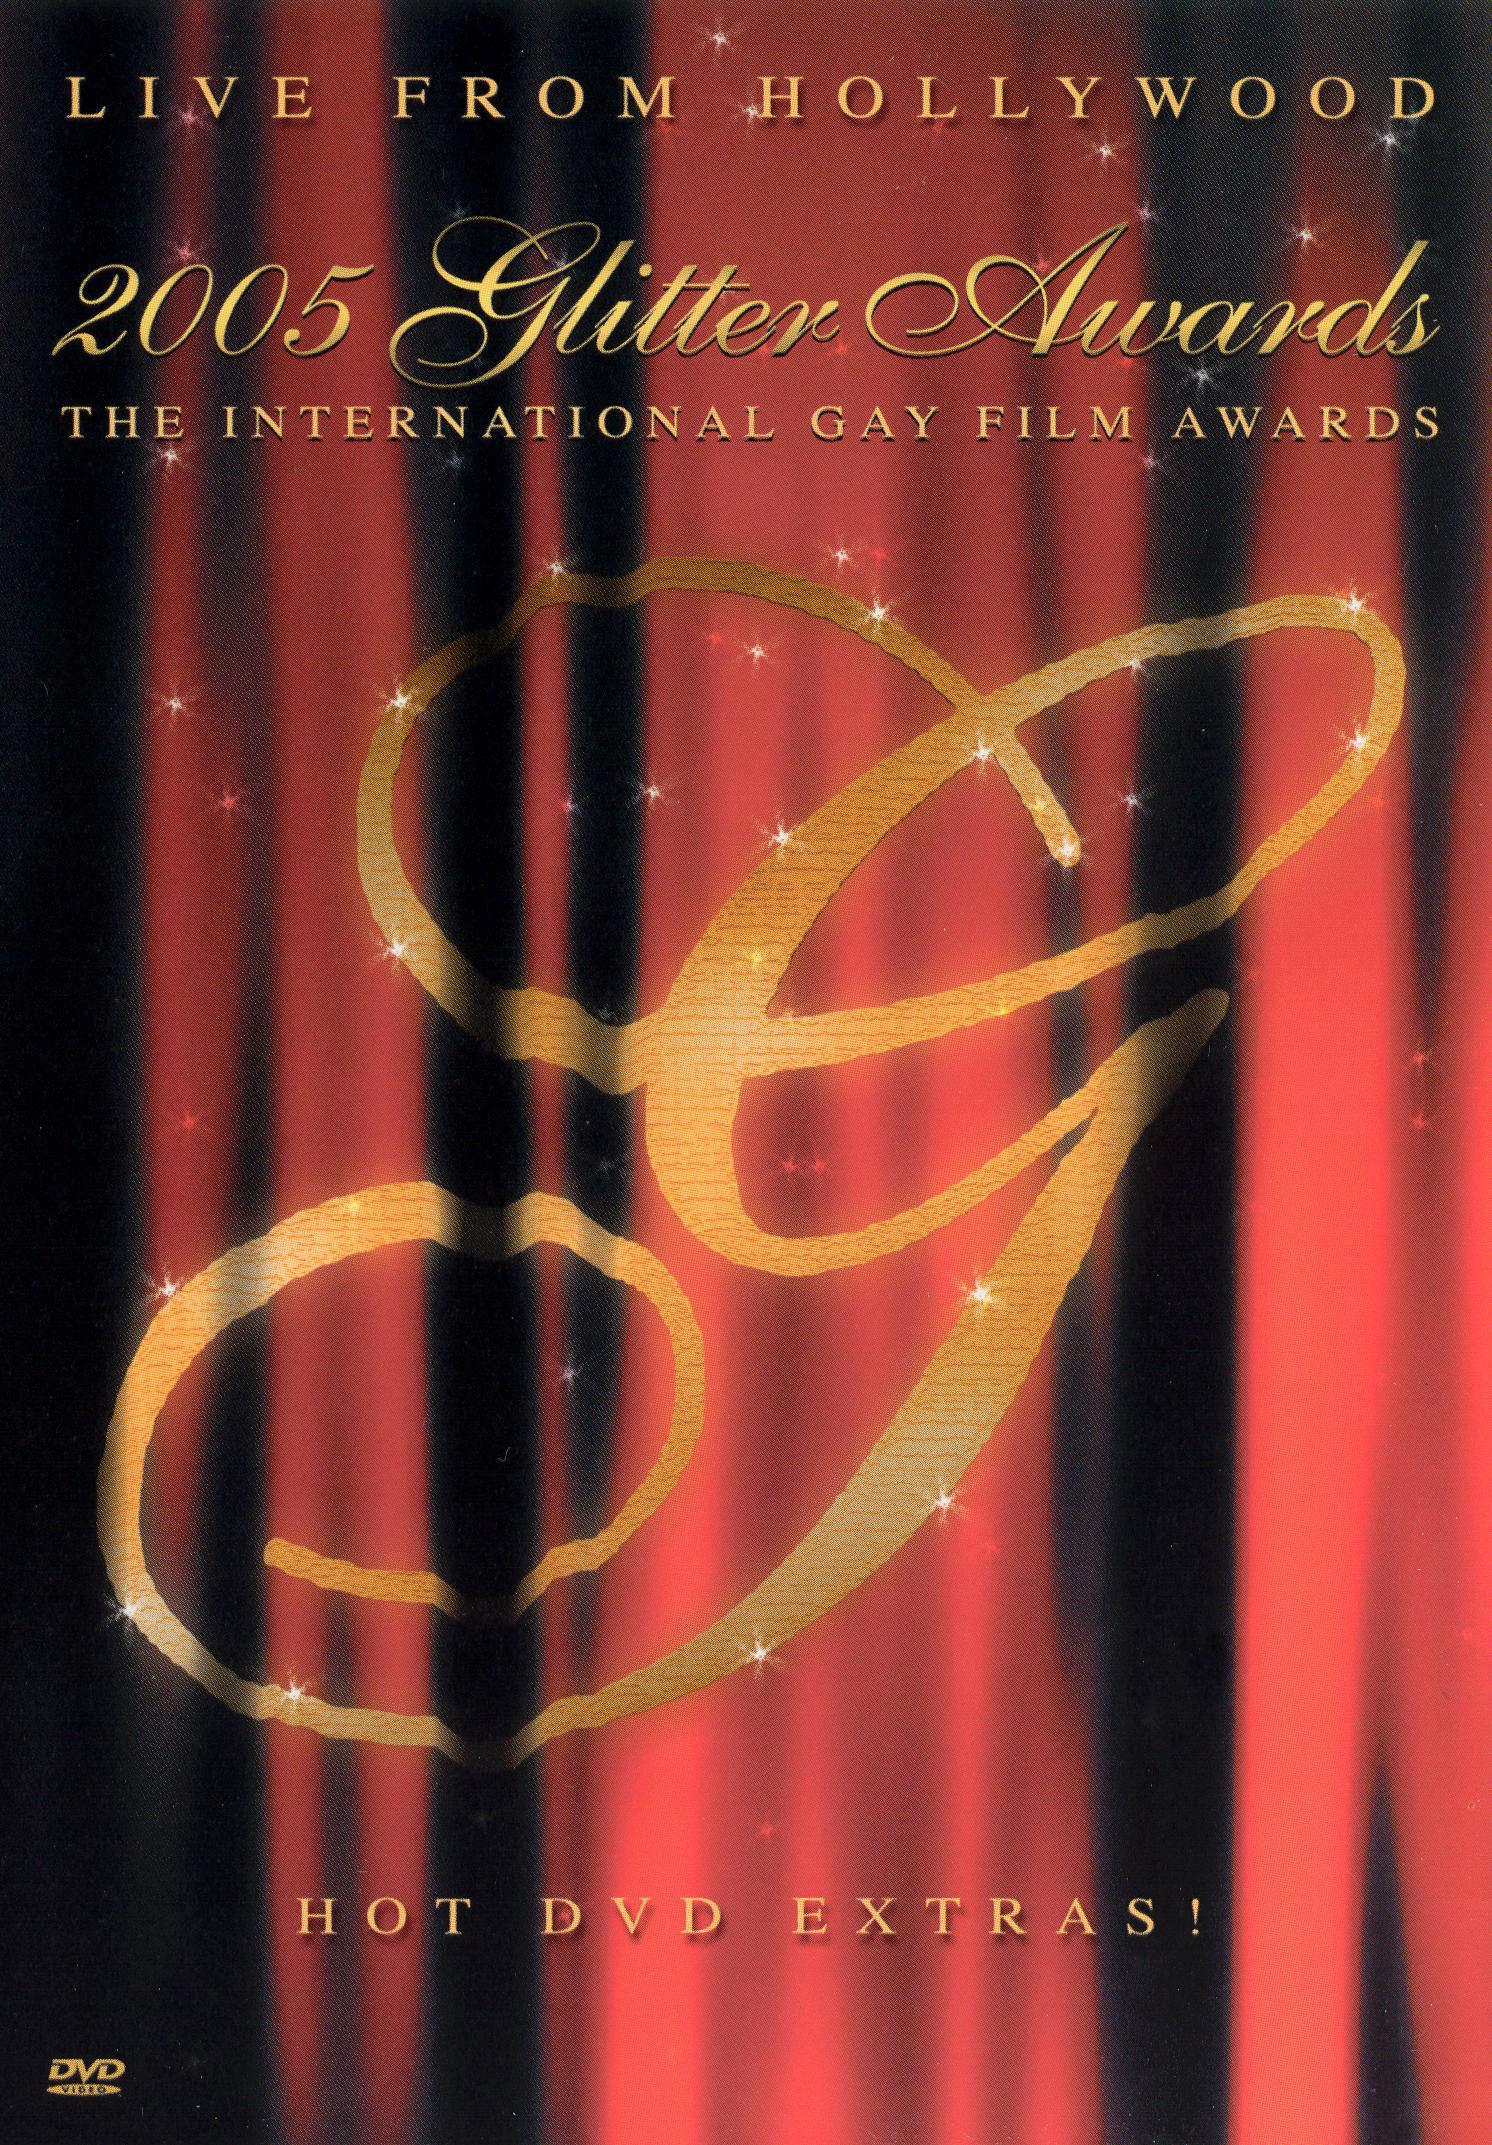 2005 Glitter Awards: The International Gay Film Awards